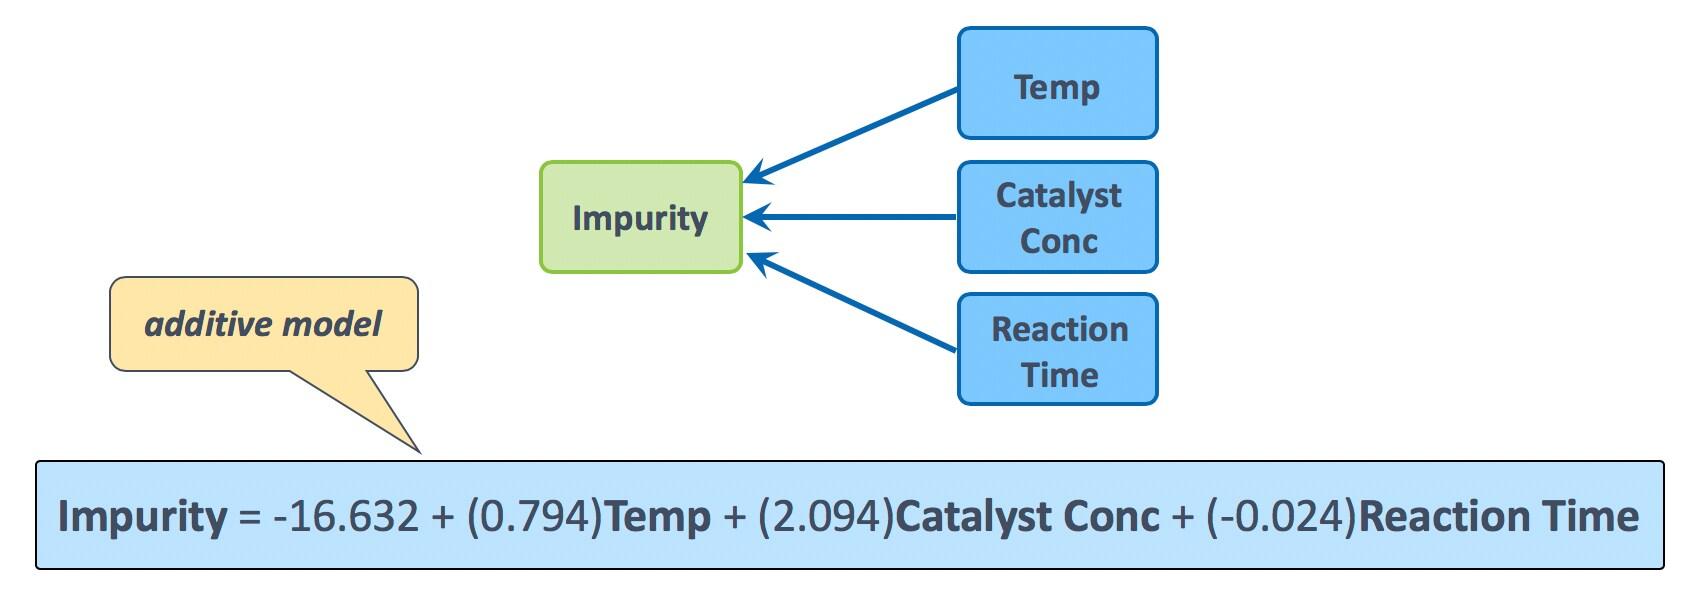 mlr-interactions-additive